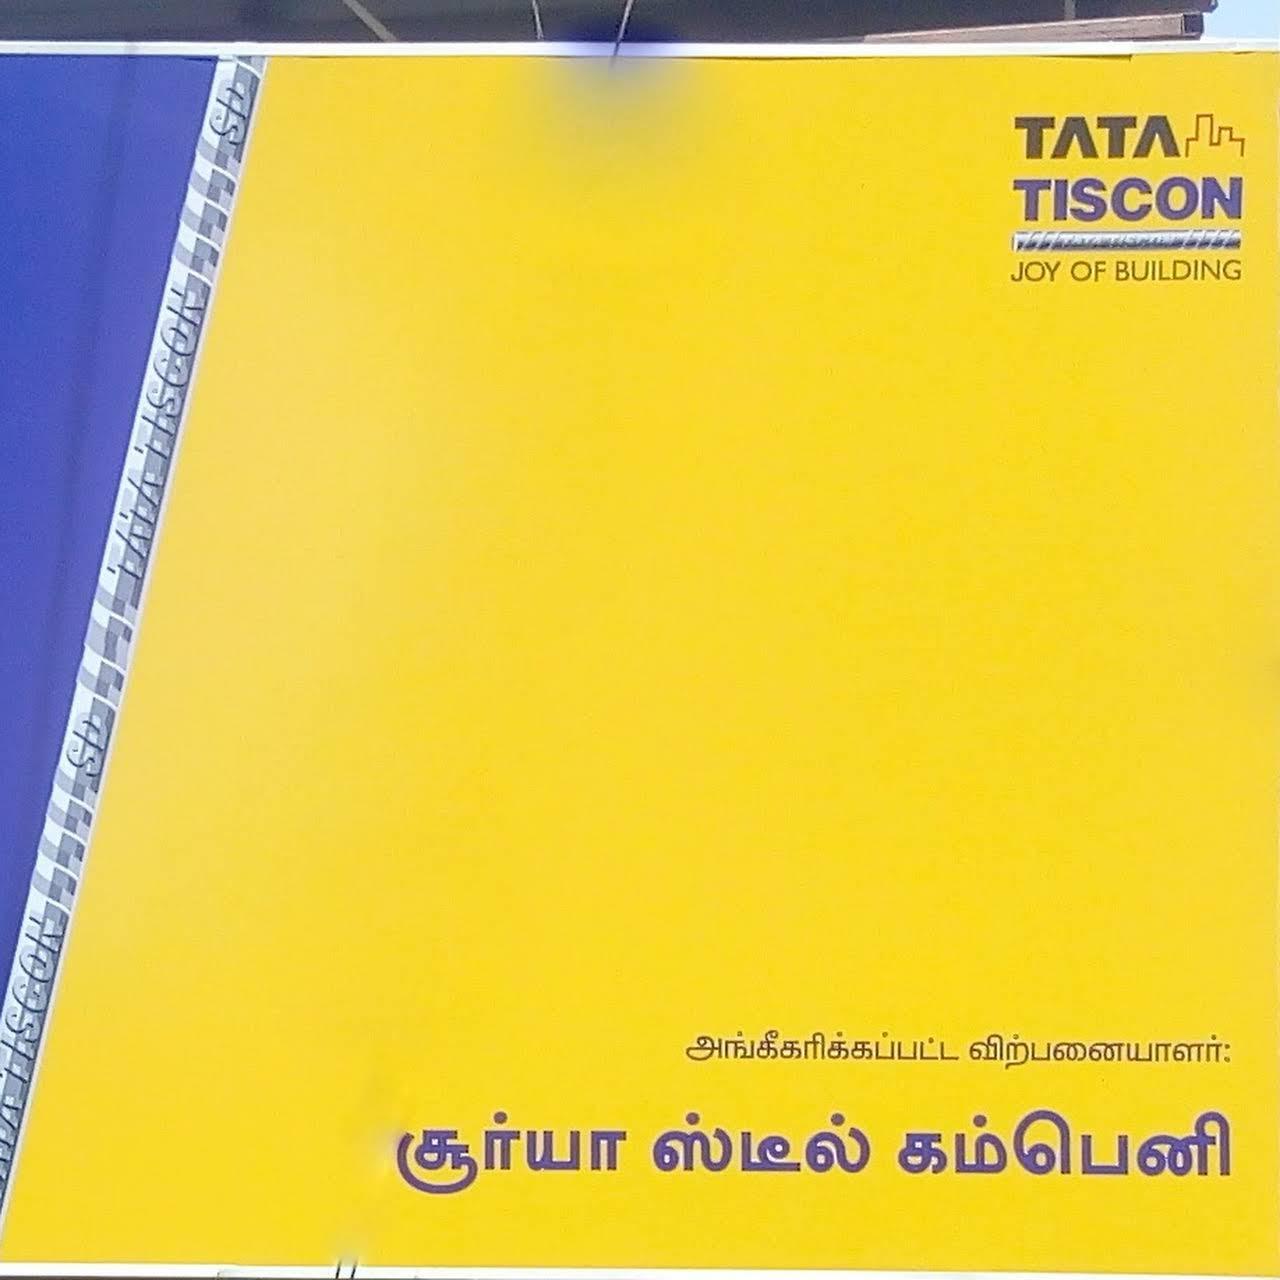 surya-steel-company-authorized-tata-tiscon-dealer business site